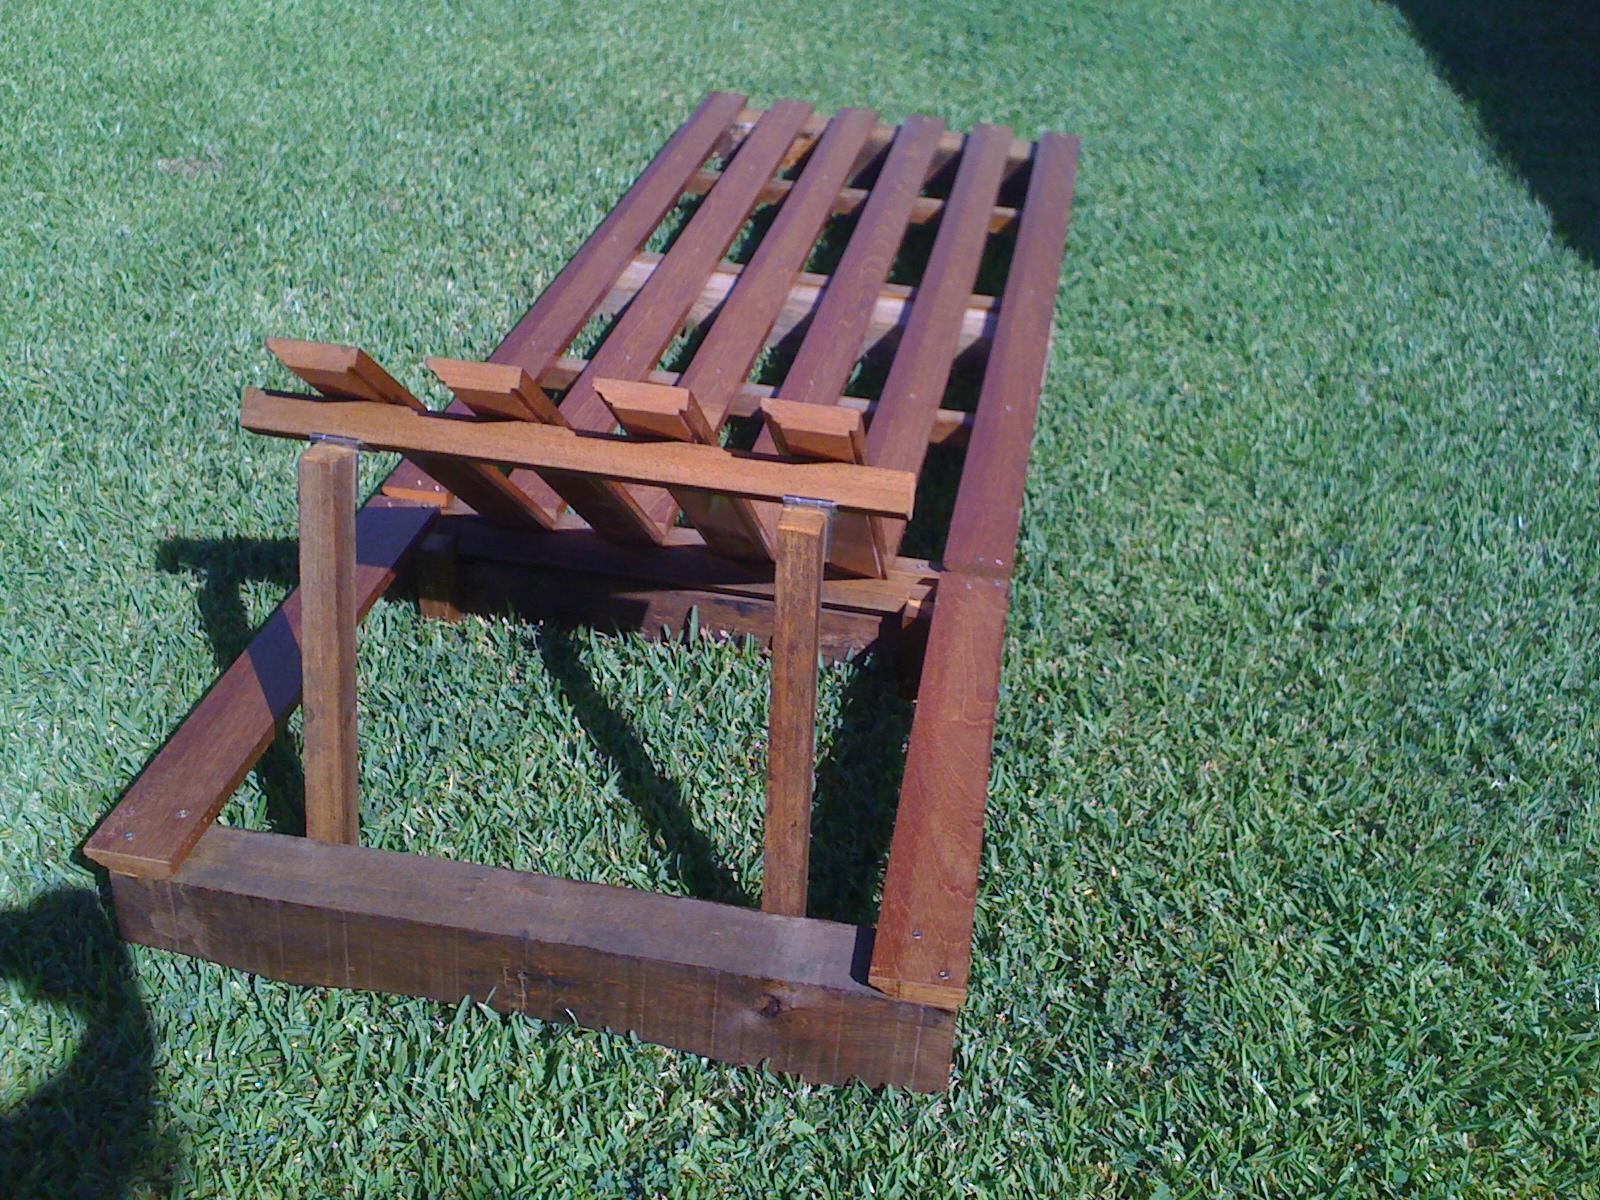 La tumbona de restos de mobiliario de alex - Tumbonas de madera ...